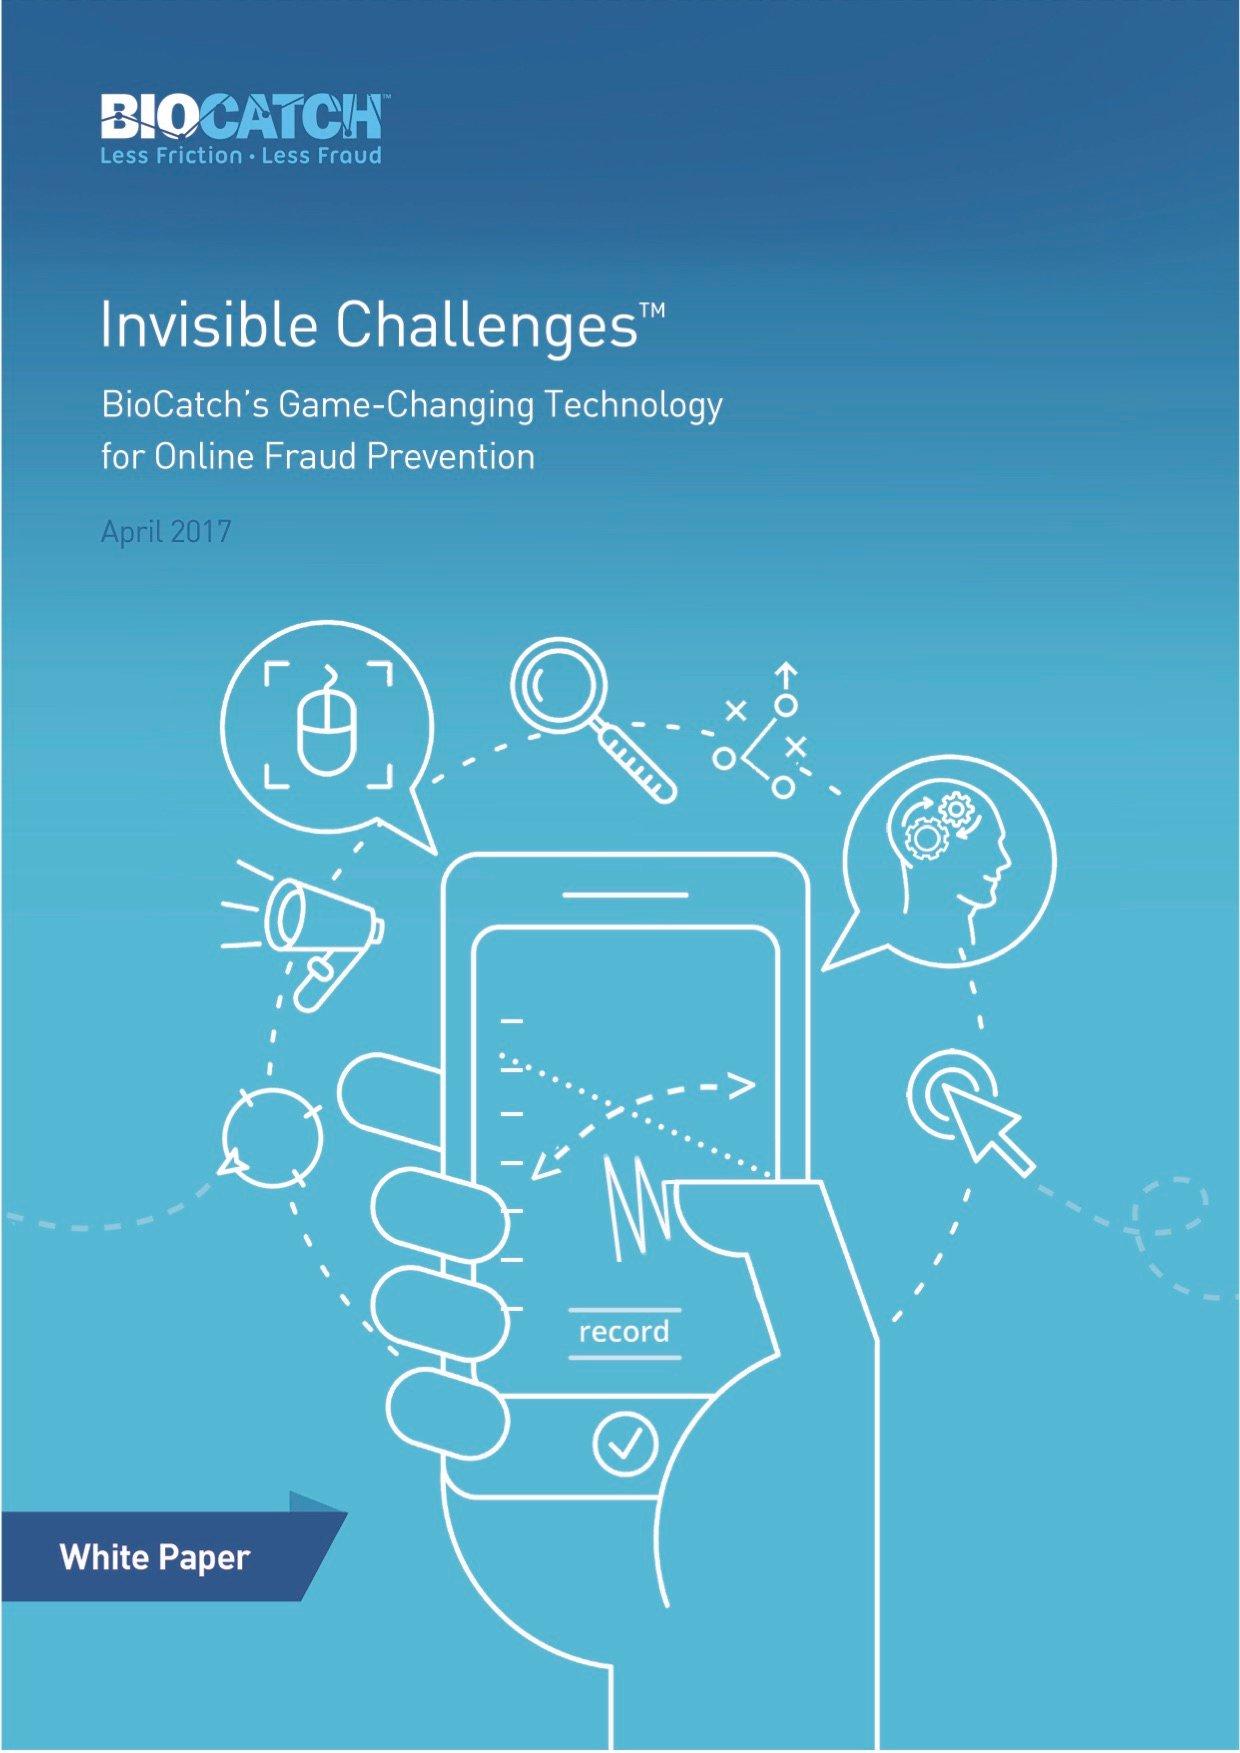 BioCatch_Invisible_Challenges_ FINAL-FINAL (23.4.17)-1